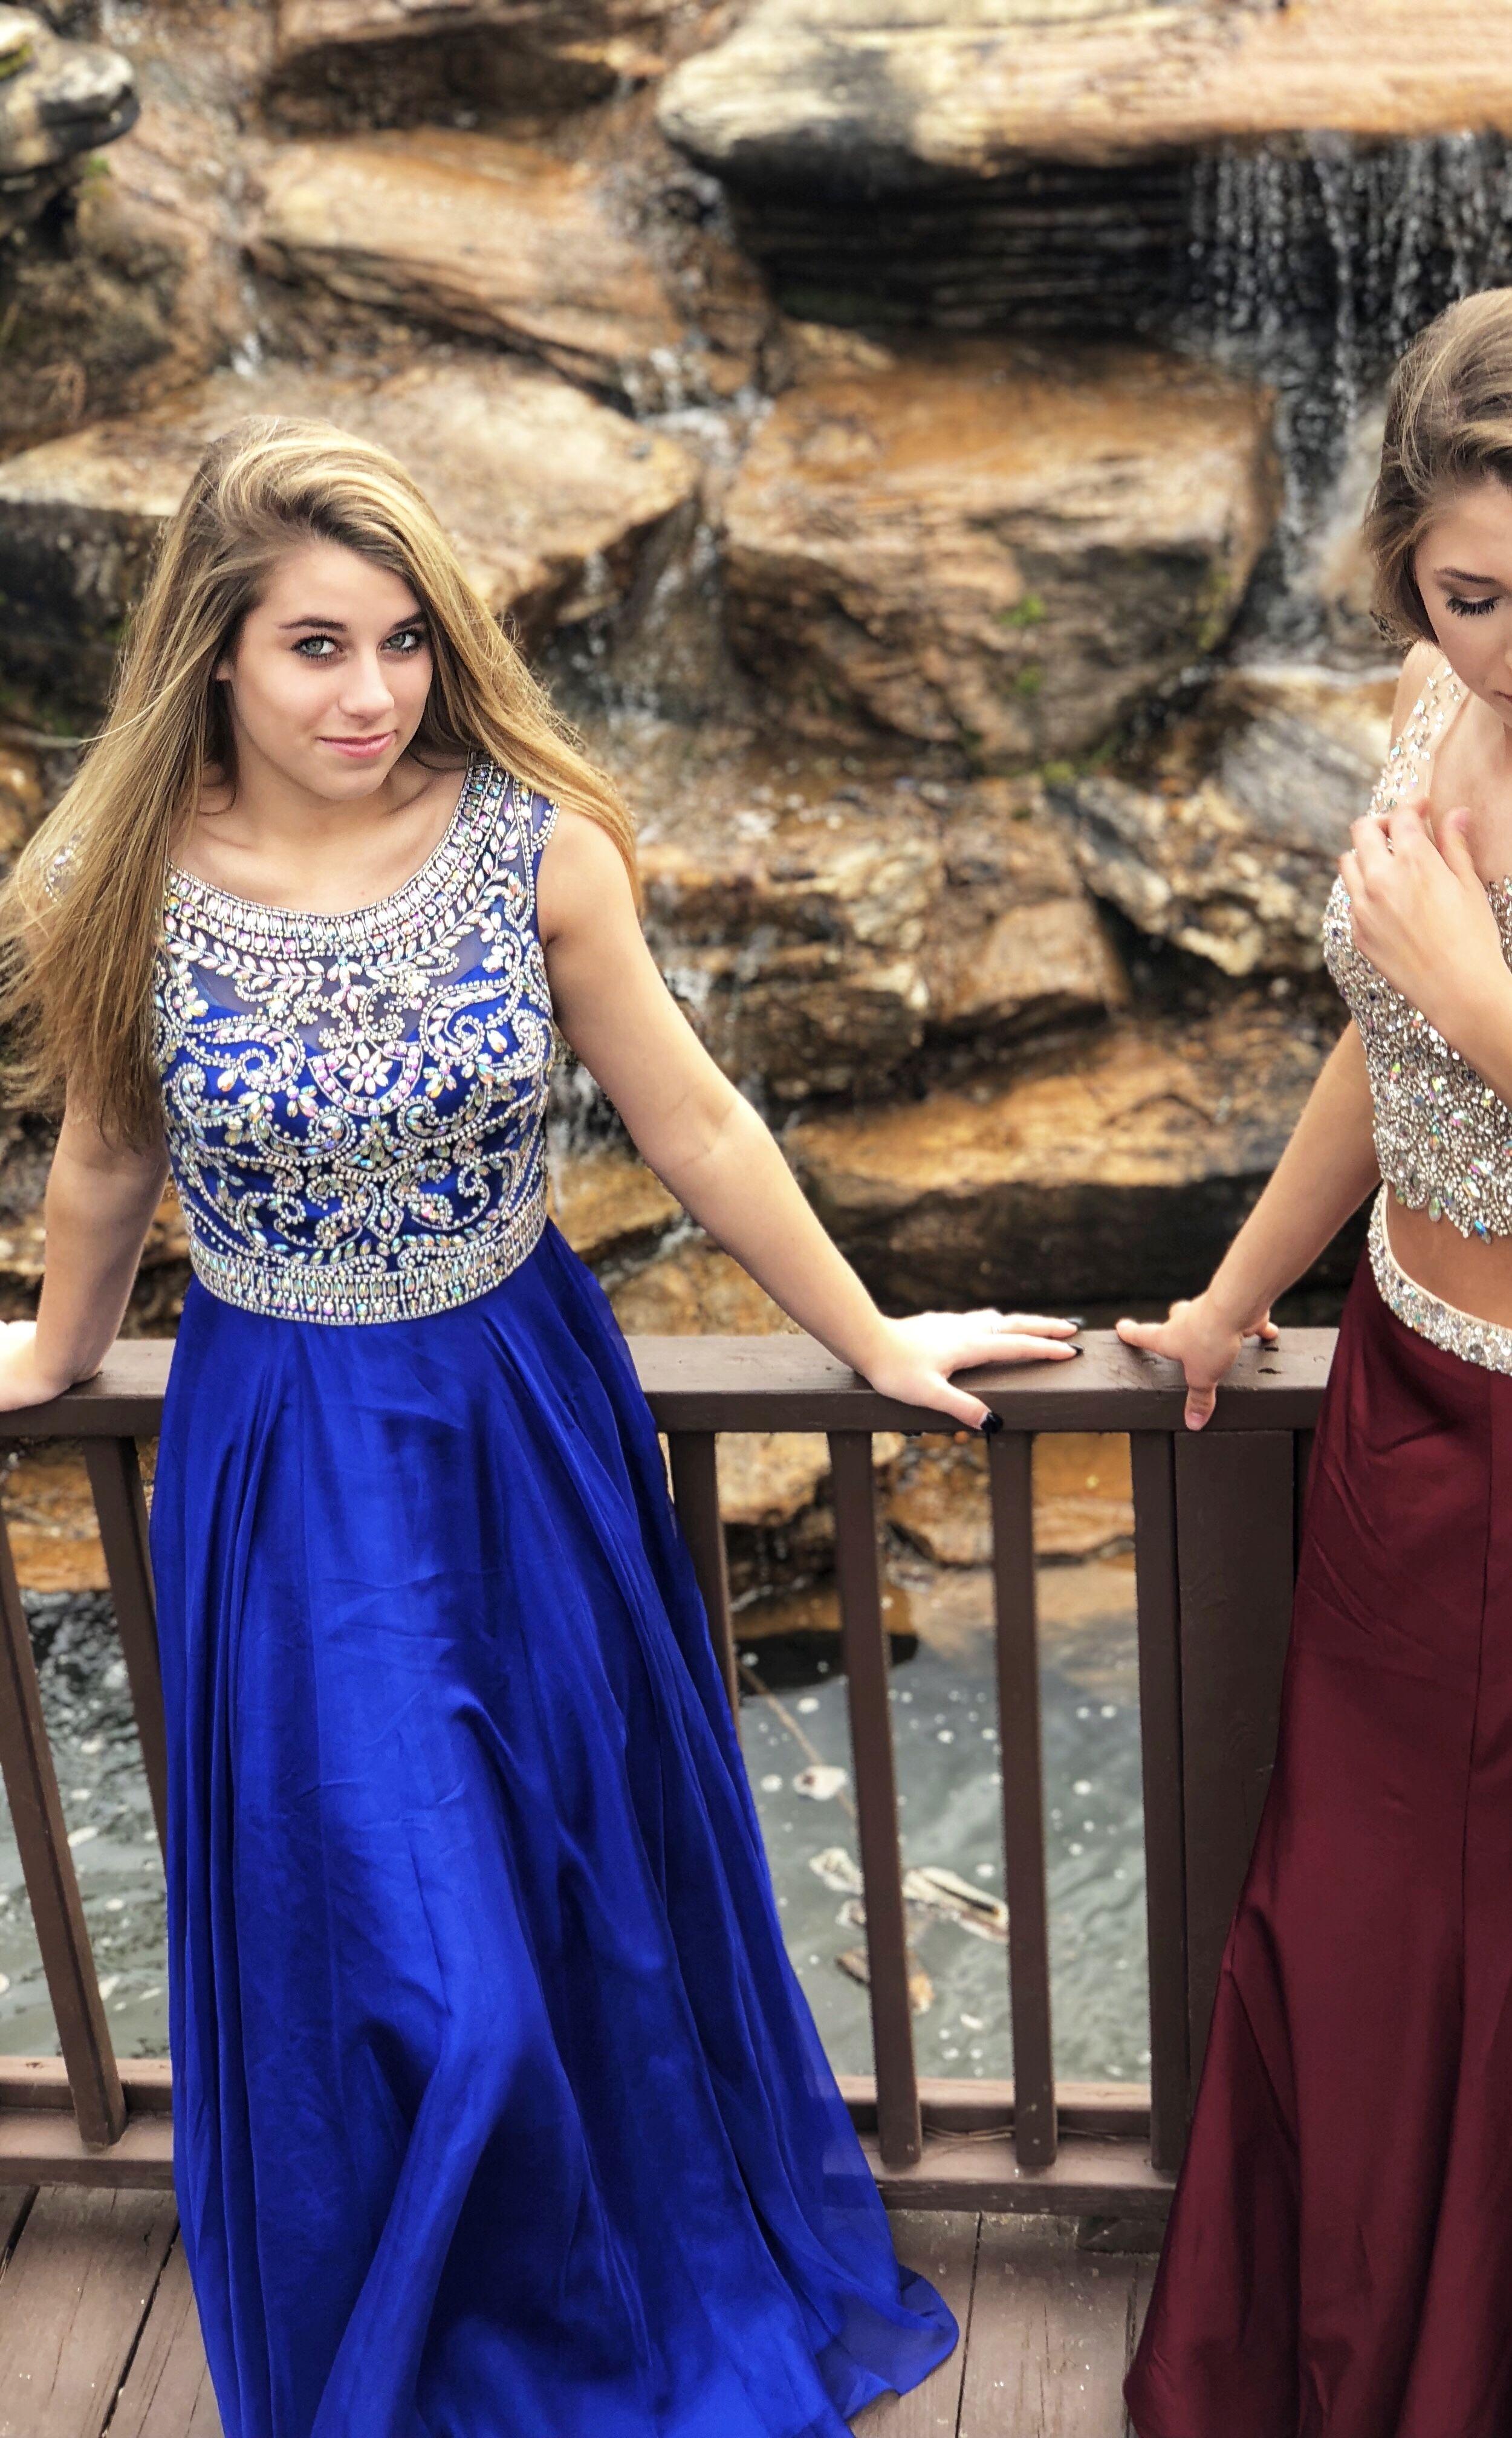 Blue Prom Dress Amiesbridal Georgia Prom Prom2018 Northgeorgia